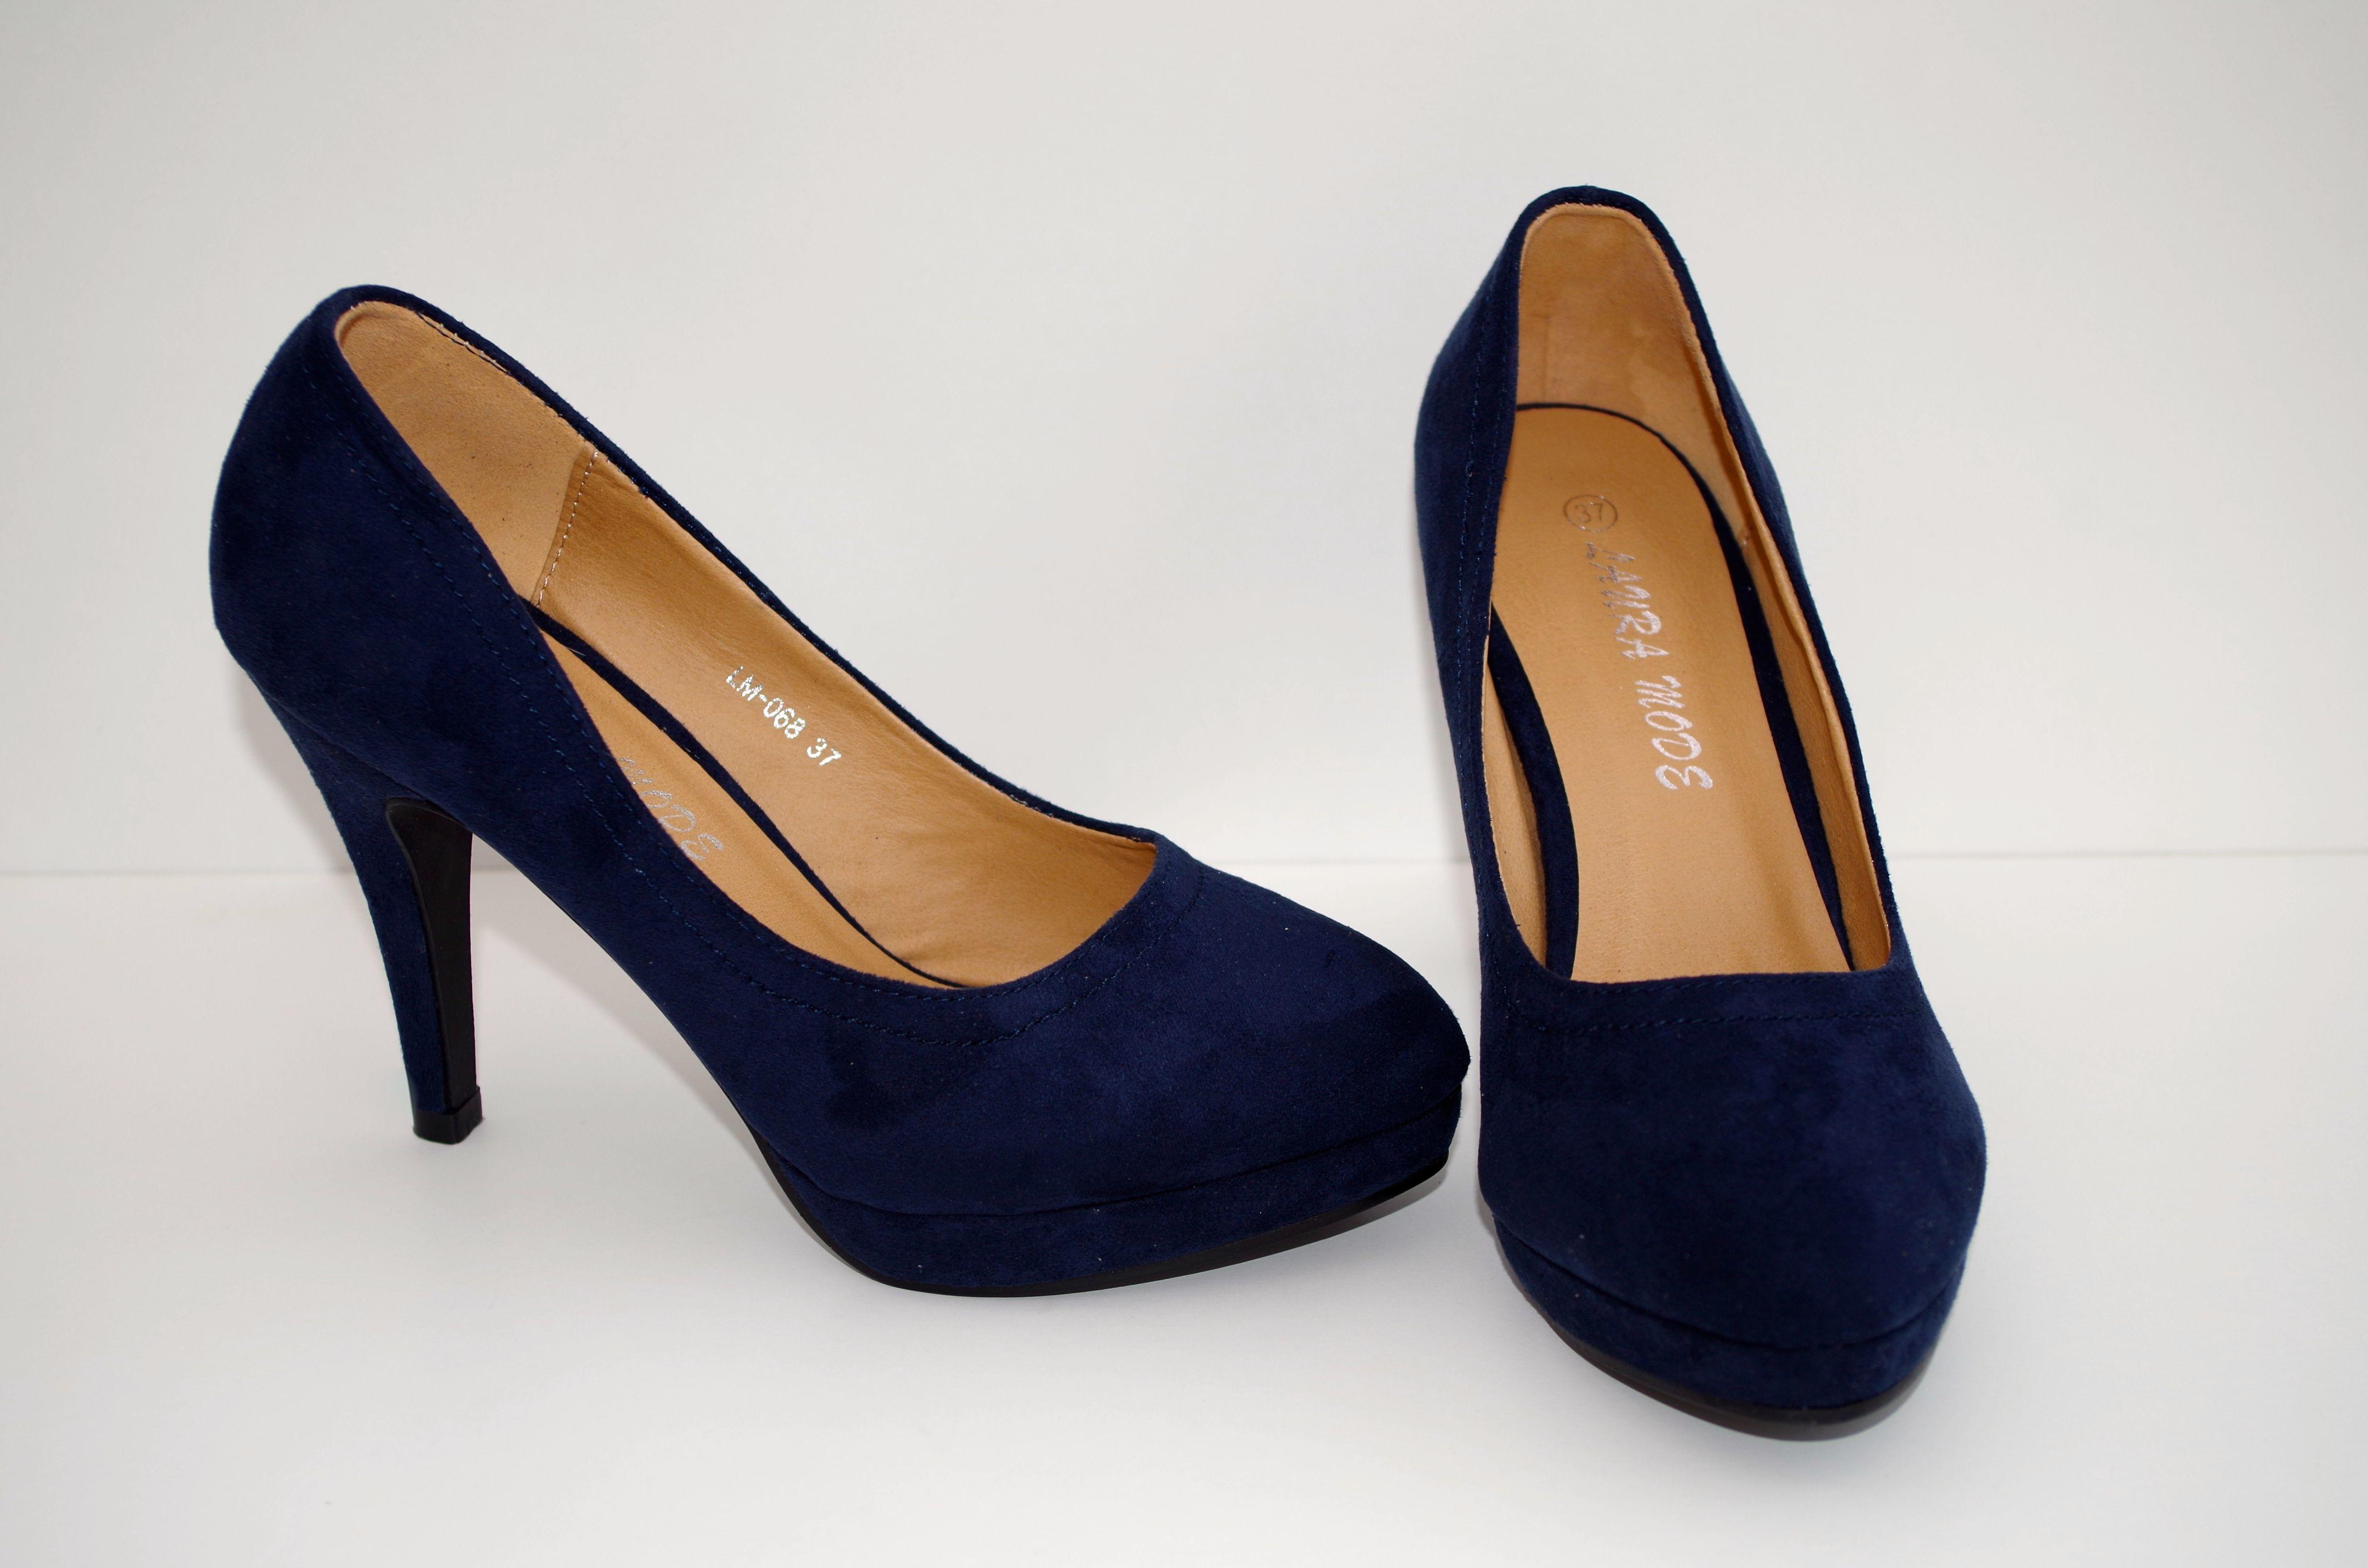 db14c0dd8ade Køb Mørkeblå sko Vanessa - Price  150